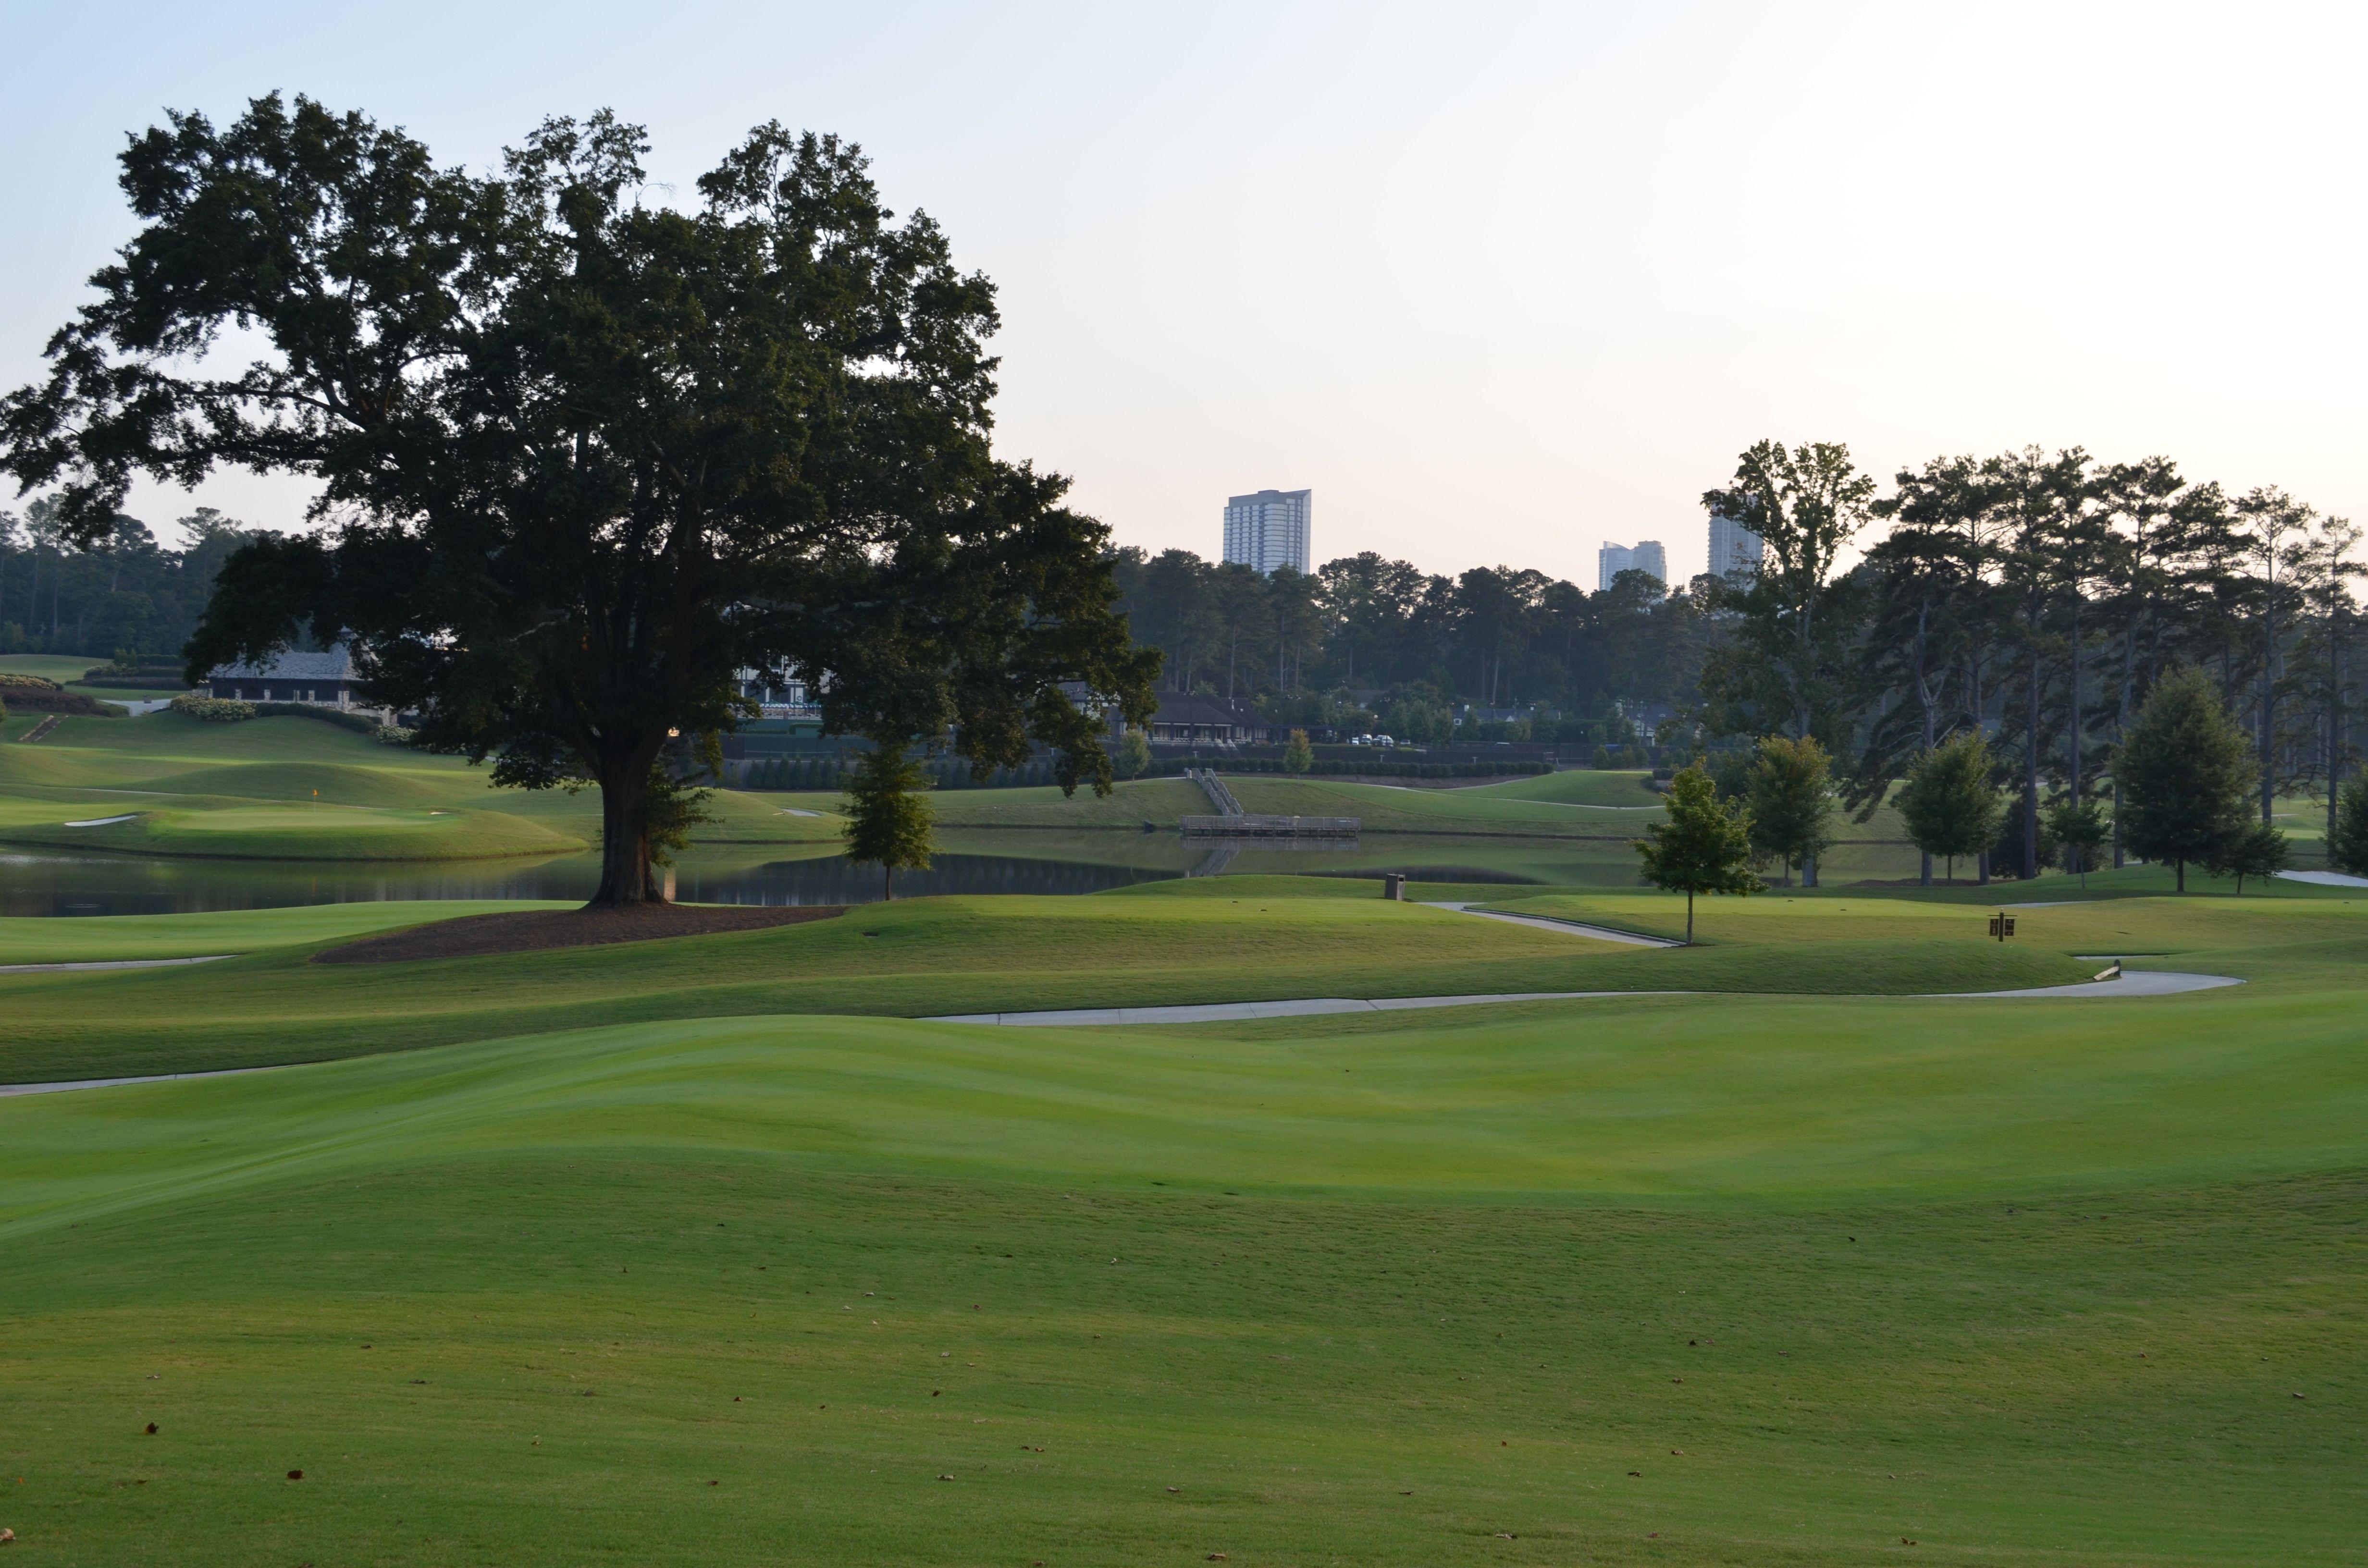 36+ Capital city club brookhaven golf ideas